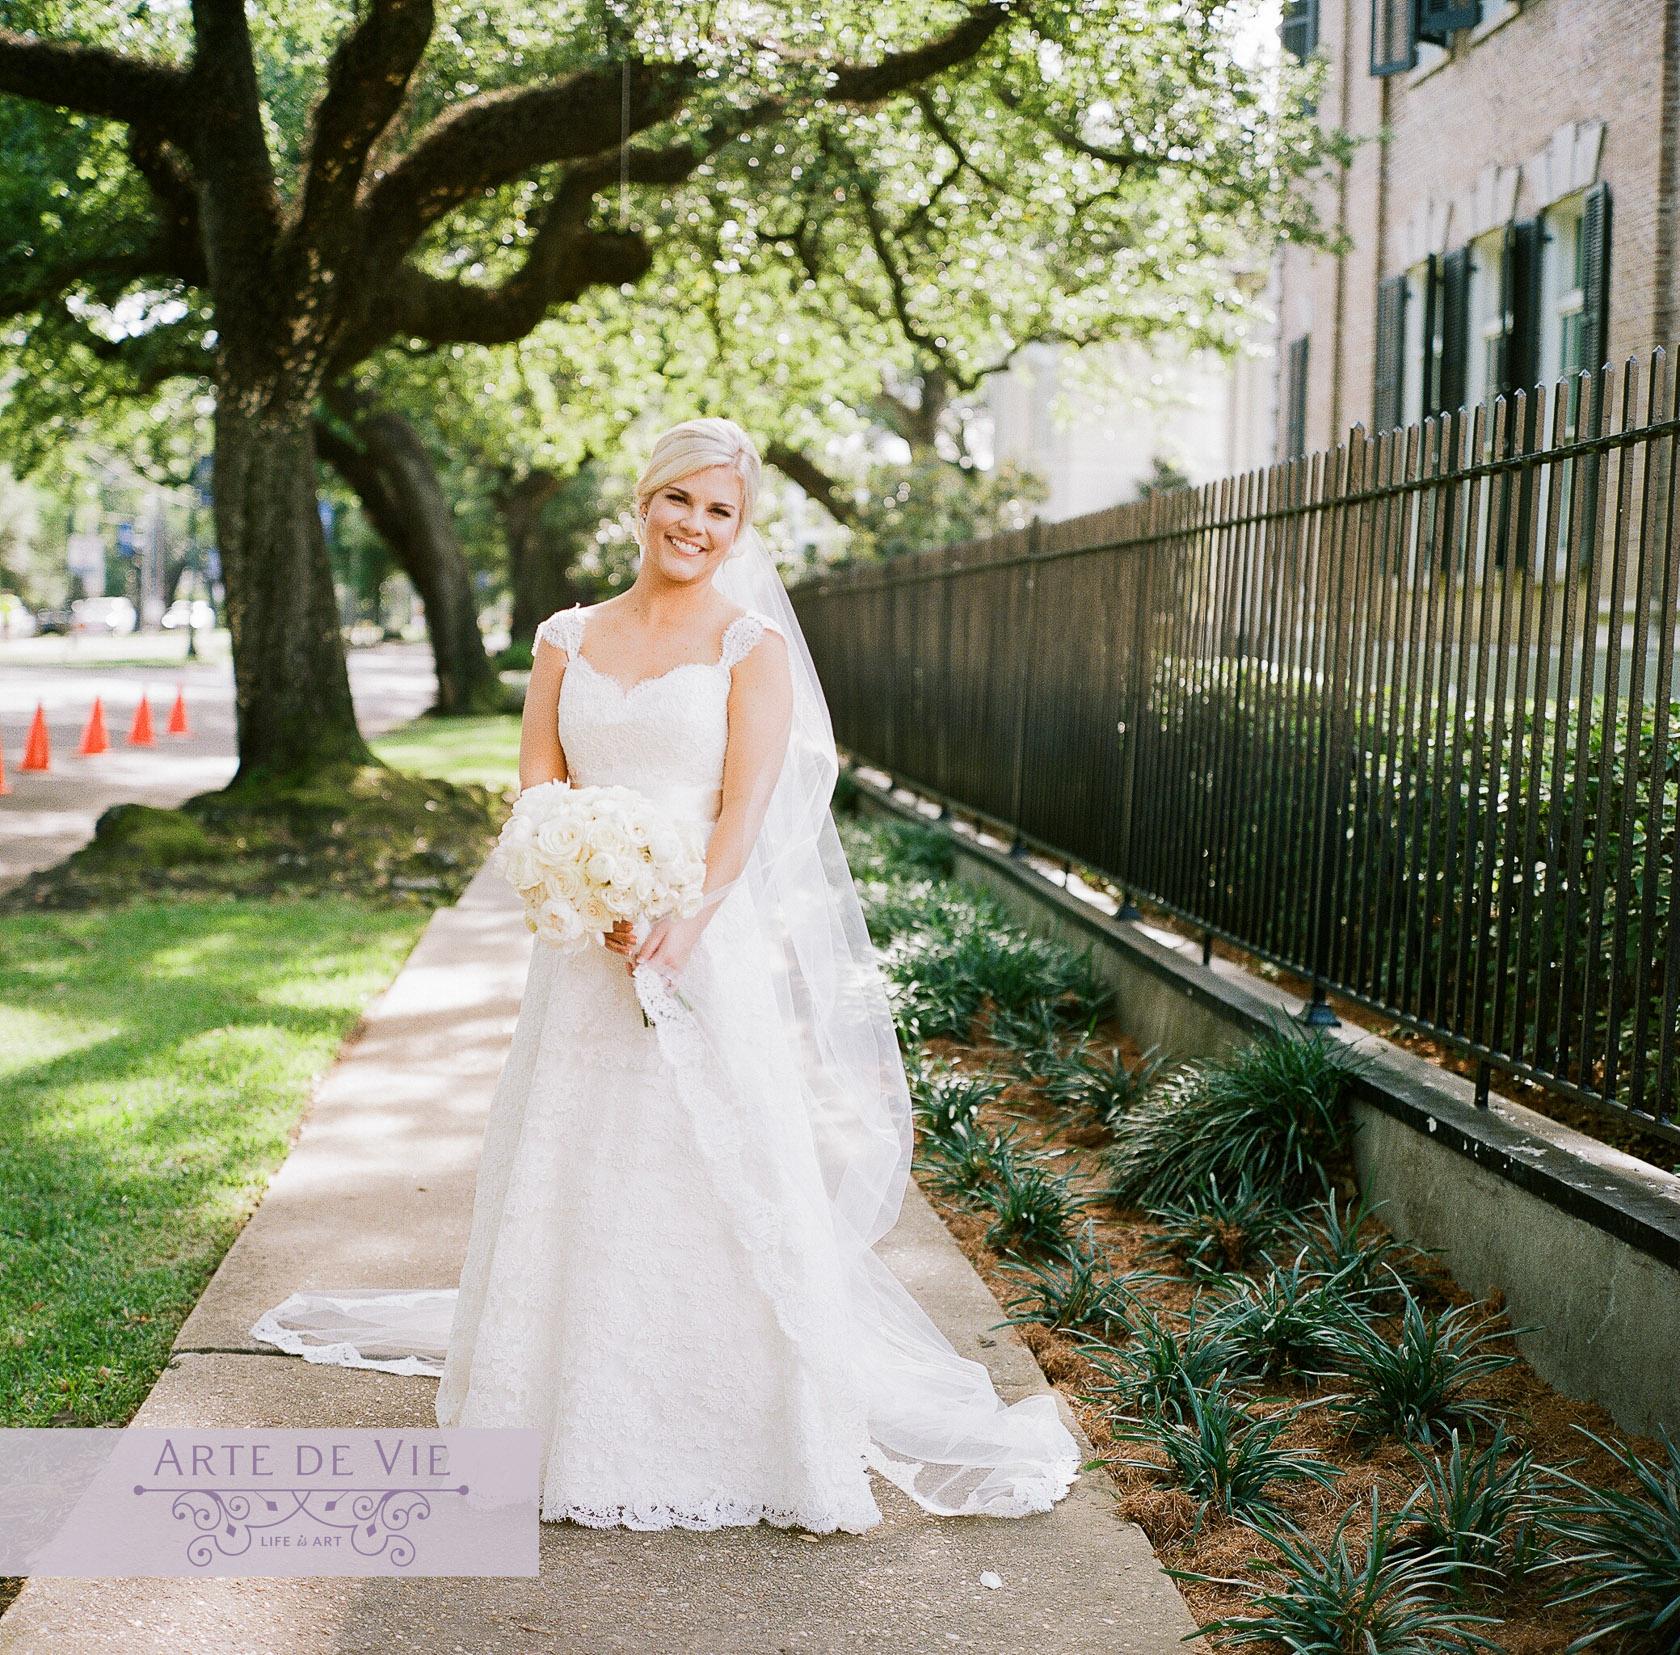 51-Echols Wedding Film Images.jpg